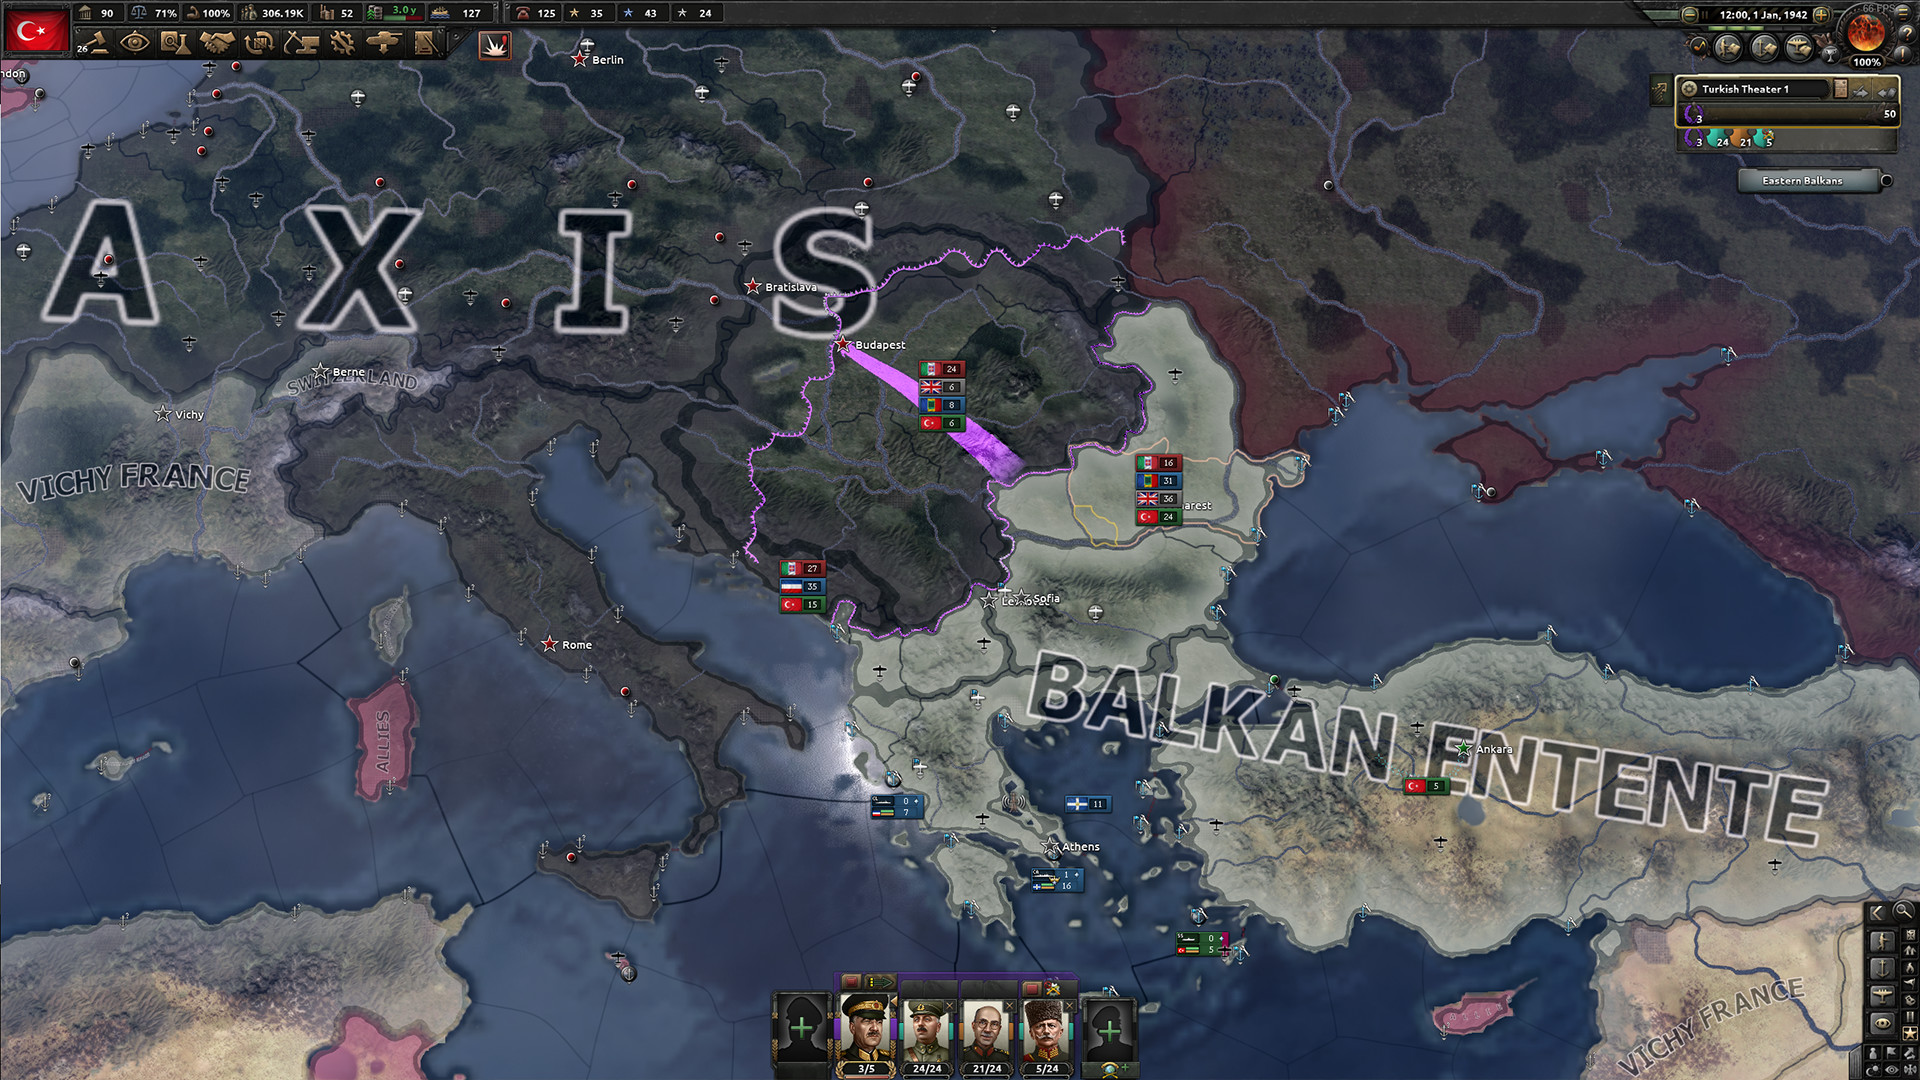 Expansion - Hearts of Iron IV: Battle for the Bosporus Fiyat Karşılaştırma